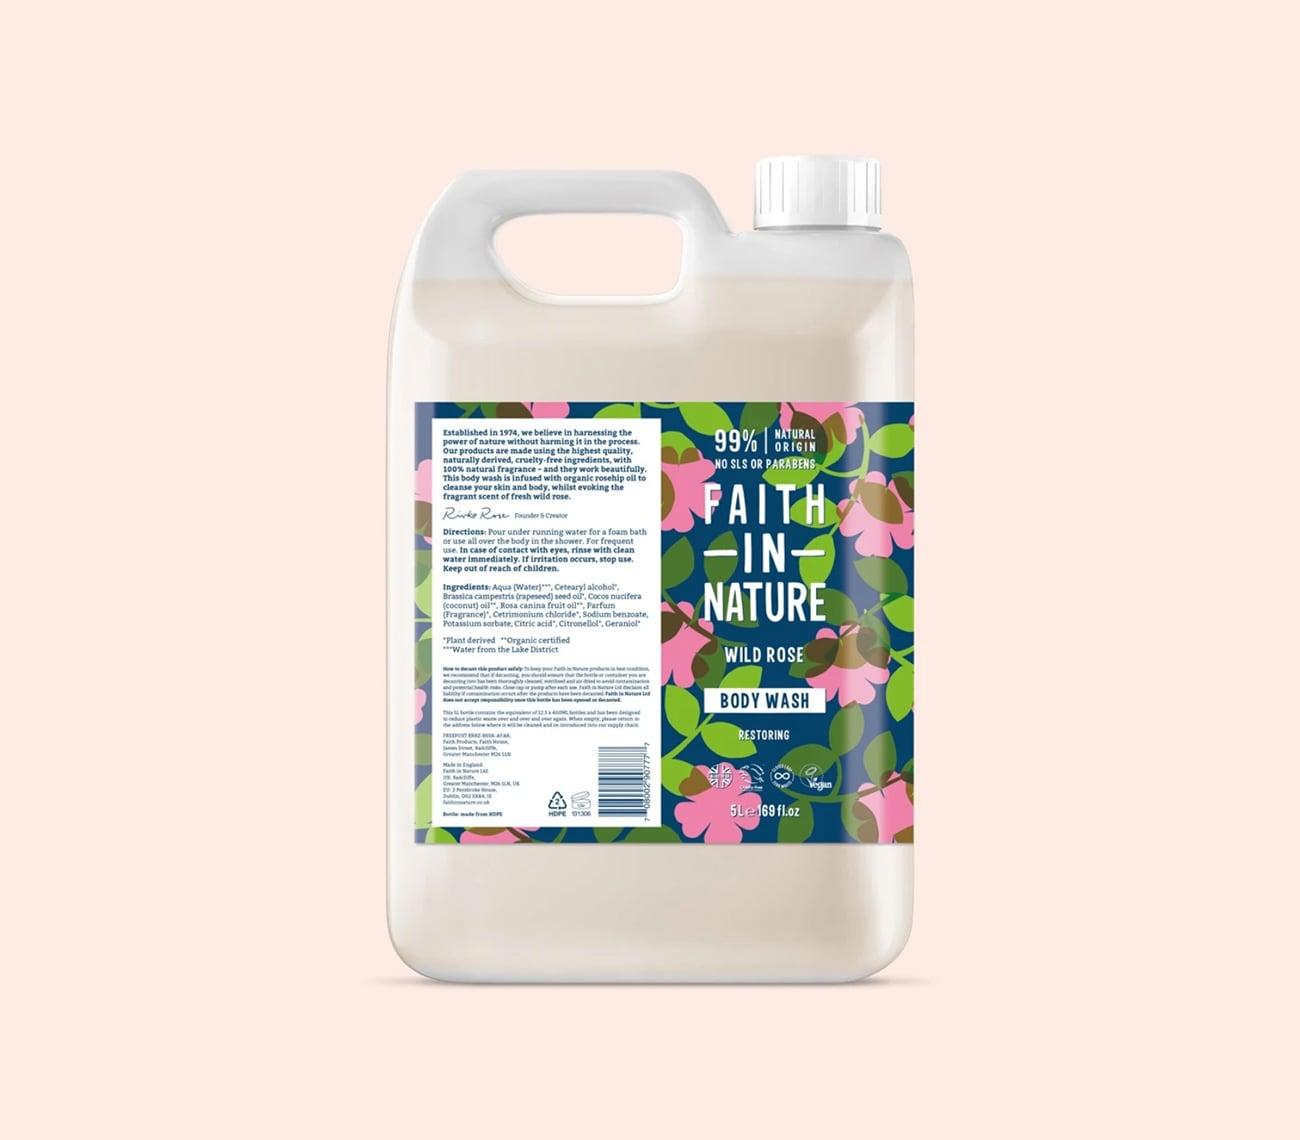 rose hand wash refill bottle